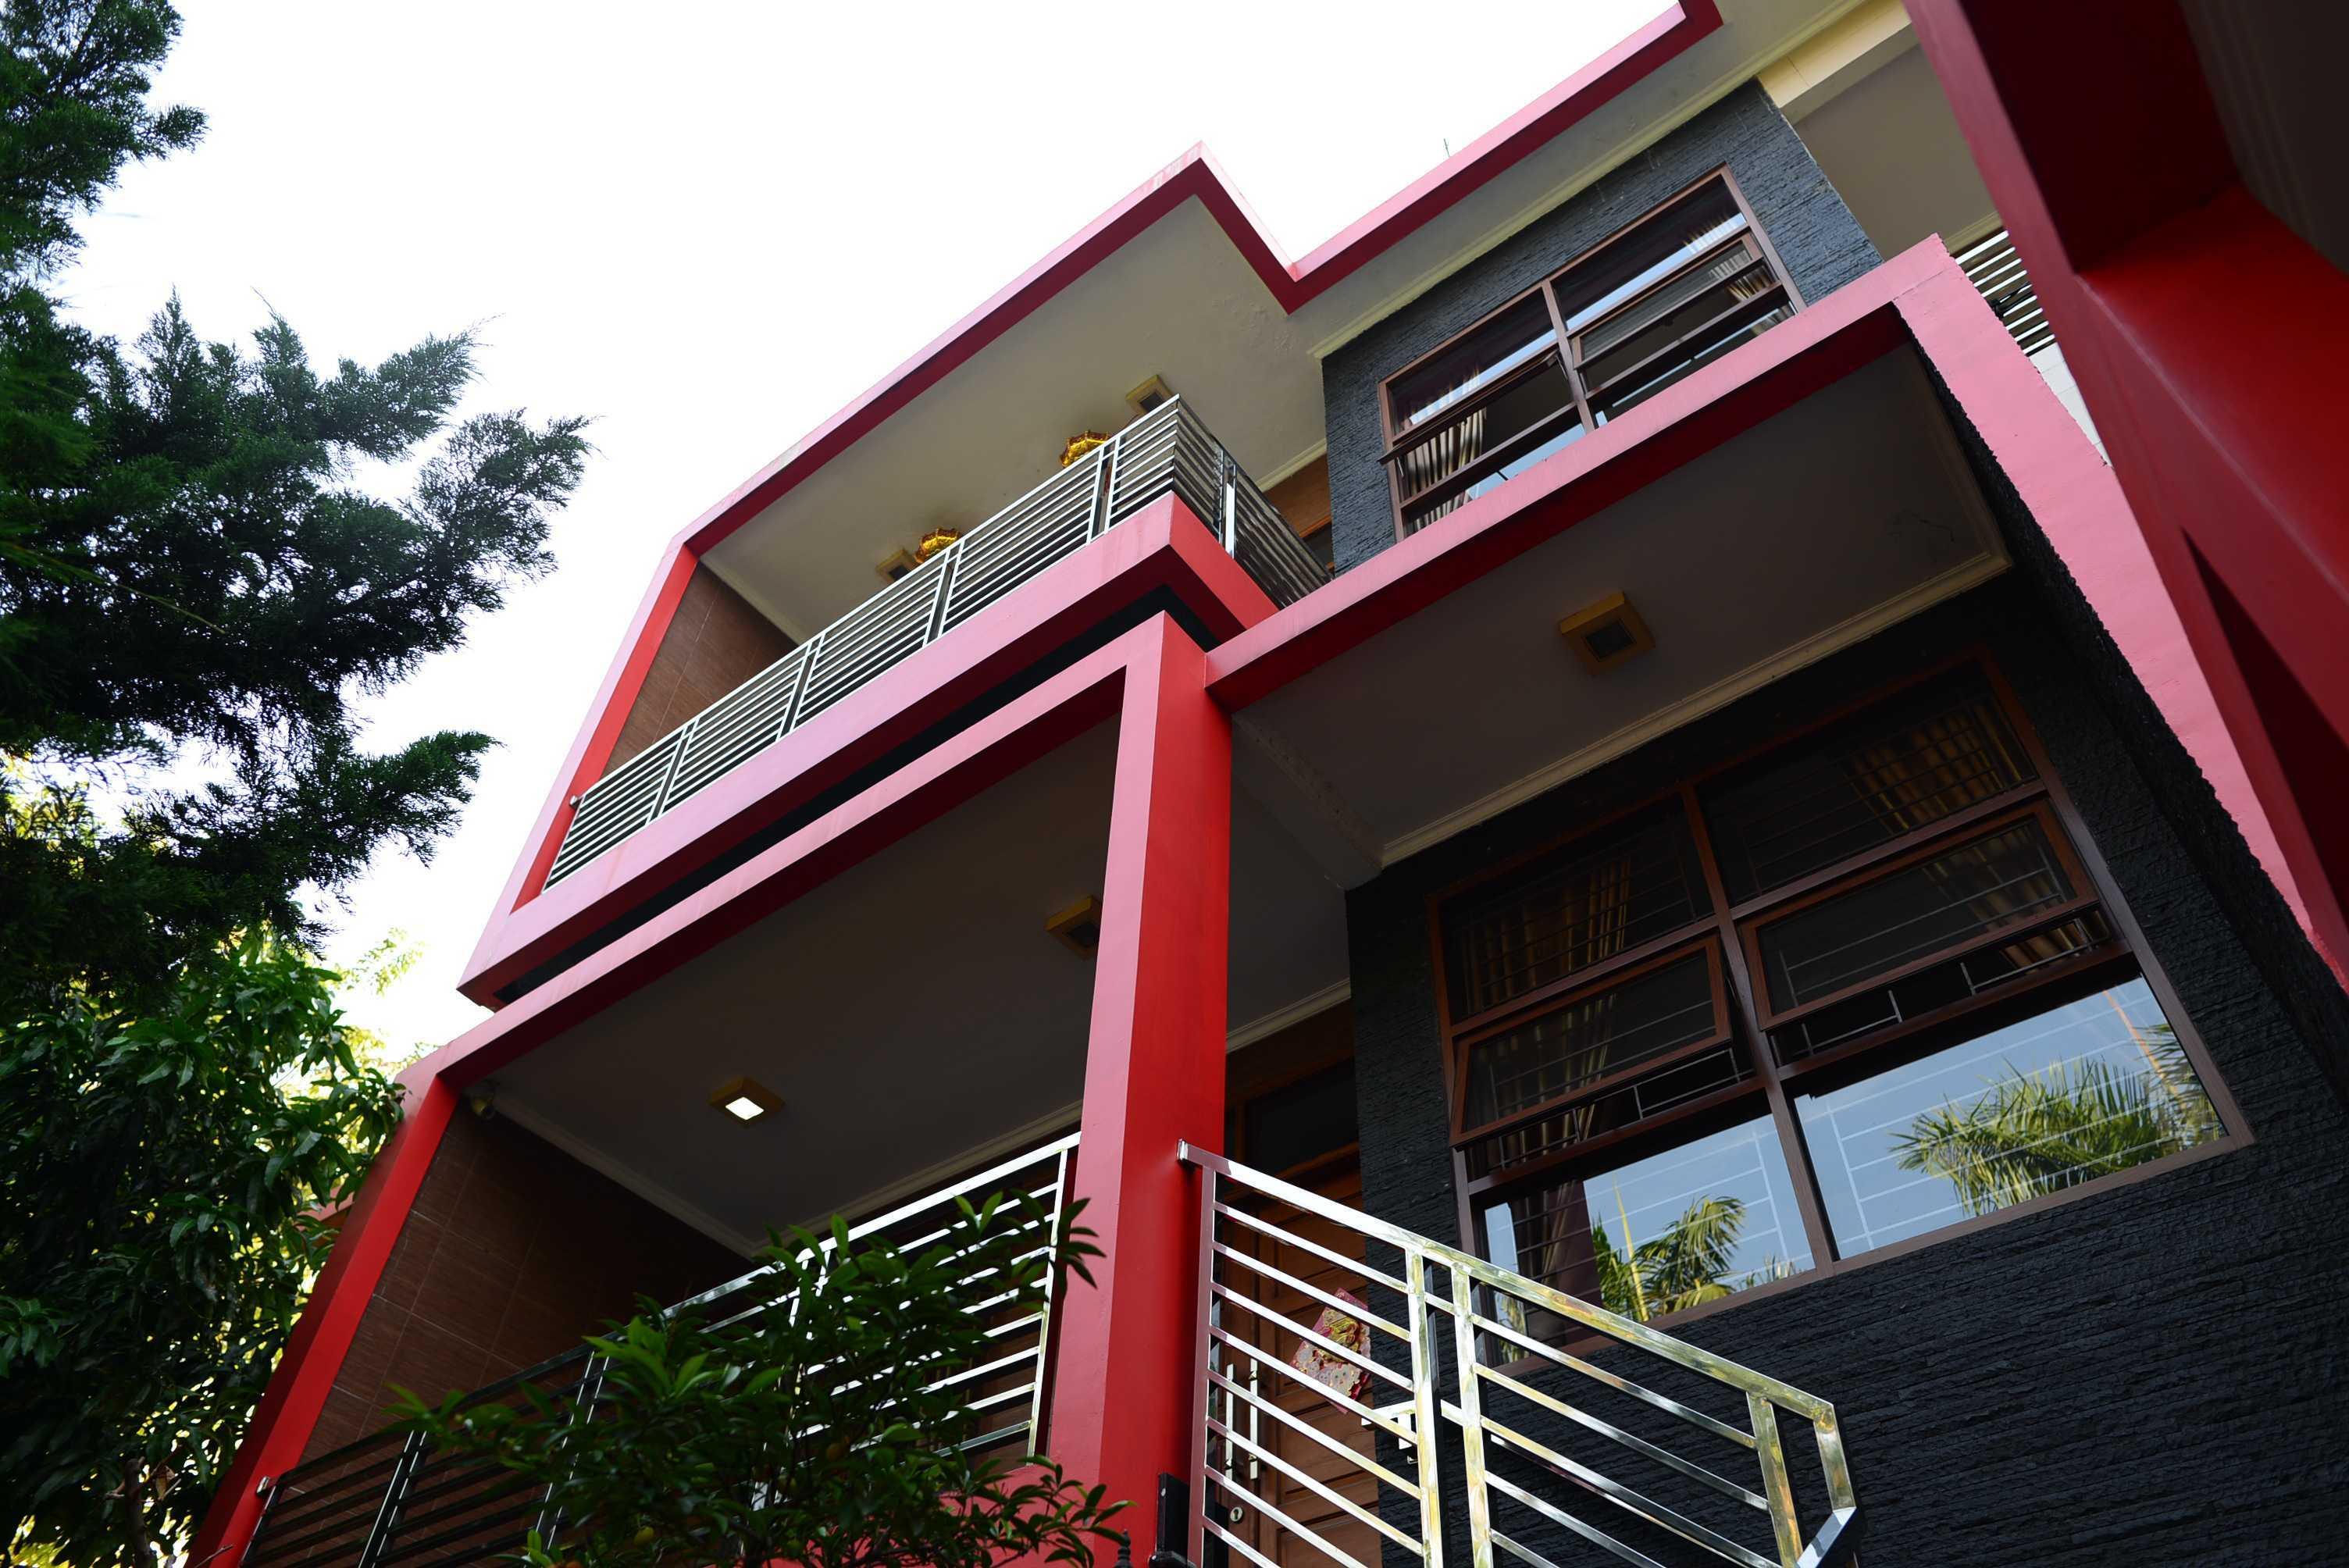 Albert Junior Ng House Jakarta, Daerah Khusus Ibukota Jakarta, Indonesia Jakarta, Daerah Khusus Ibukota Jakarta, Indonesia Albert-Junior-Ng-House   83398